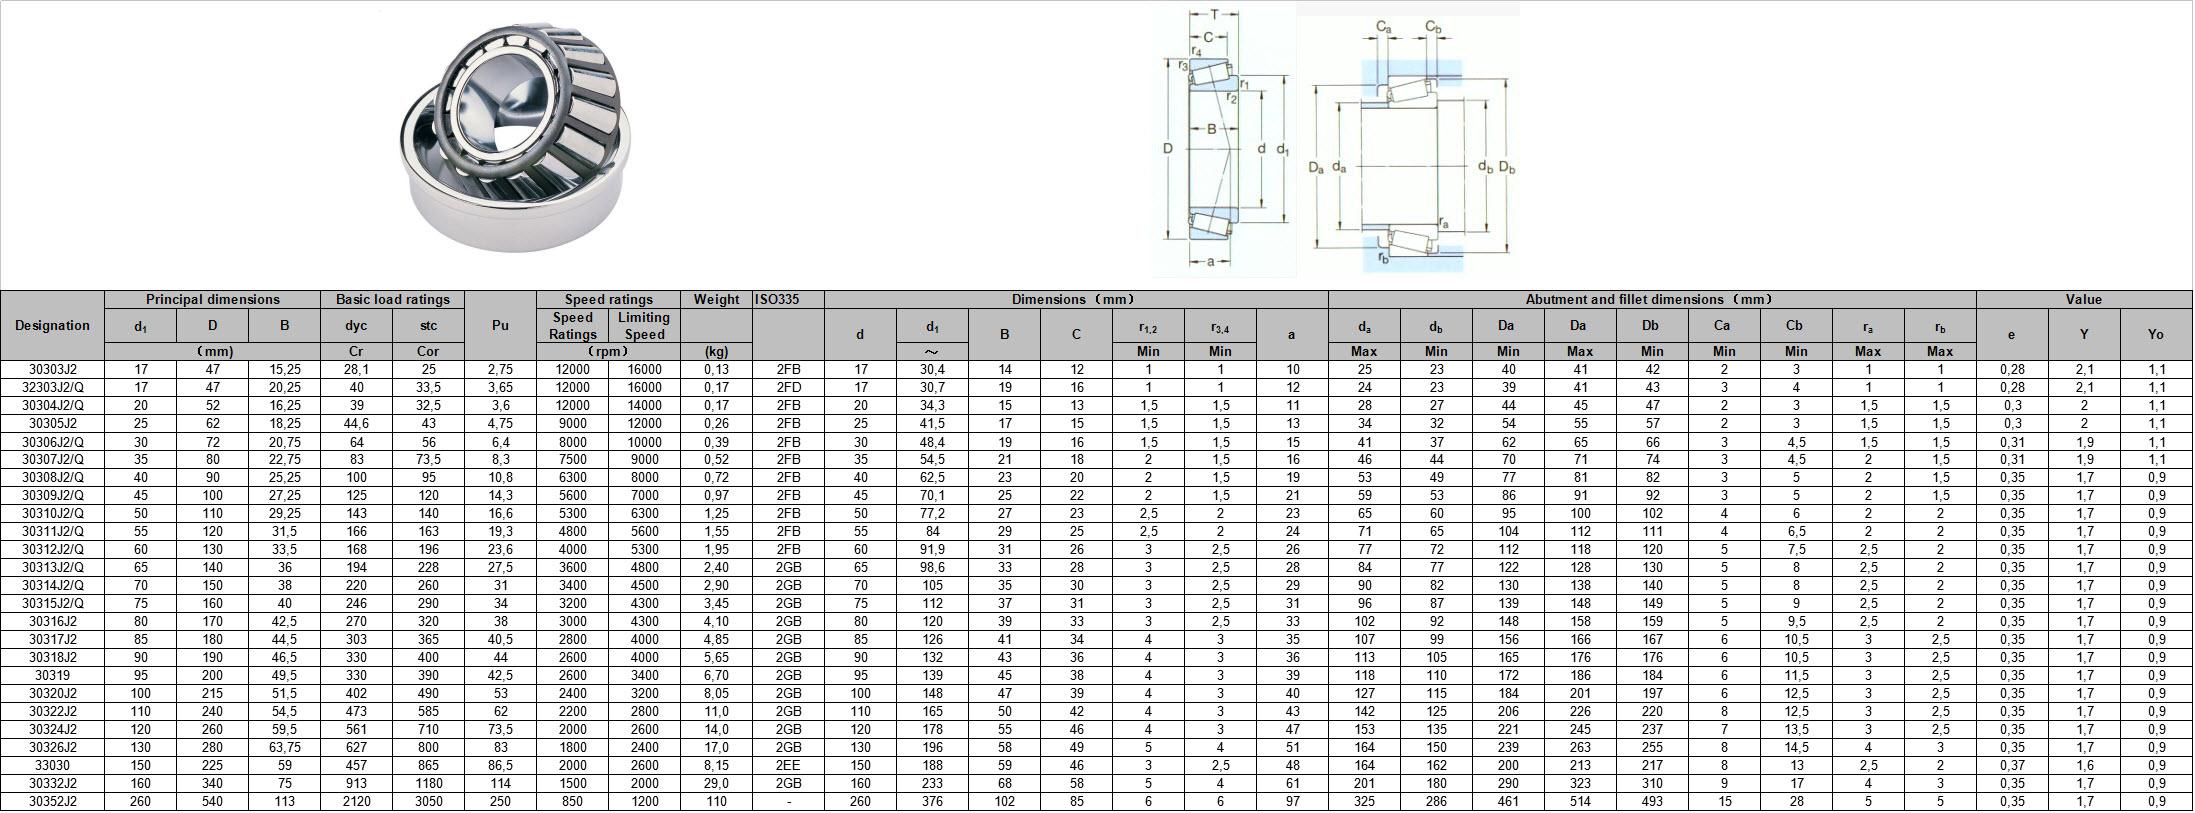 30303J2 | 32303J2/Q | 30304J2/Q | 30305J2 | 30306J2/Q | 30307J2/Q | 30308J2/Q | 30309J2/Q | 30310J2/Q | 30311J2/Q | 30312J2/Q | 30313J2/Q | 30314J2/Q | 30315J2/Q | 30316J2 | 30317J2 | 30318J2 | 30319 | 30320J2 | 30322J2 | 30324J2 | 30326J2 | 33030 | 30332J2 | 30352J2